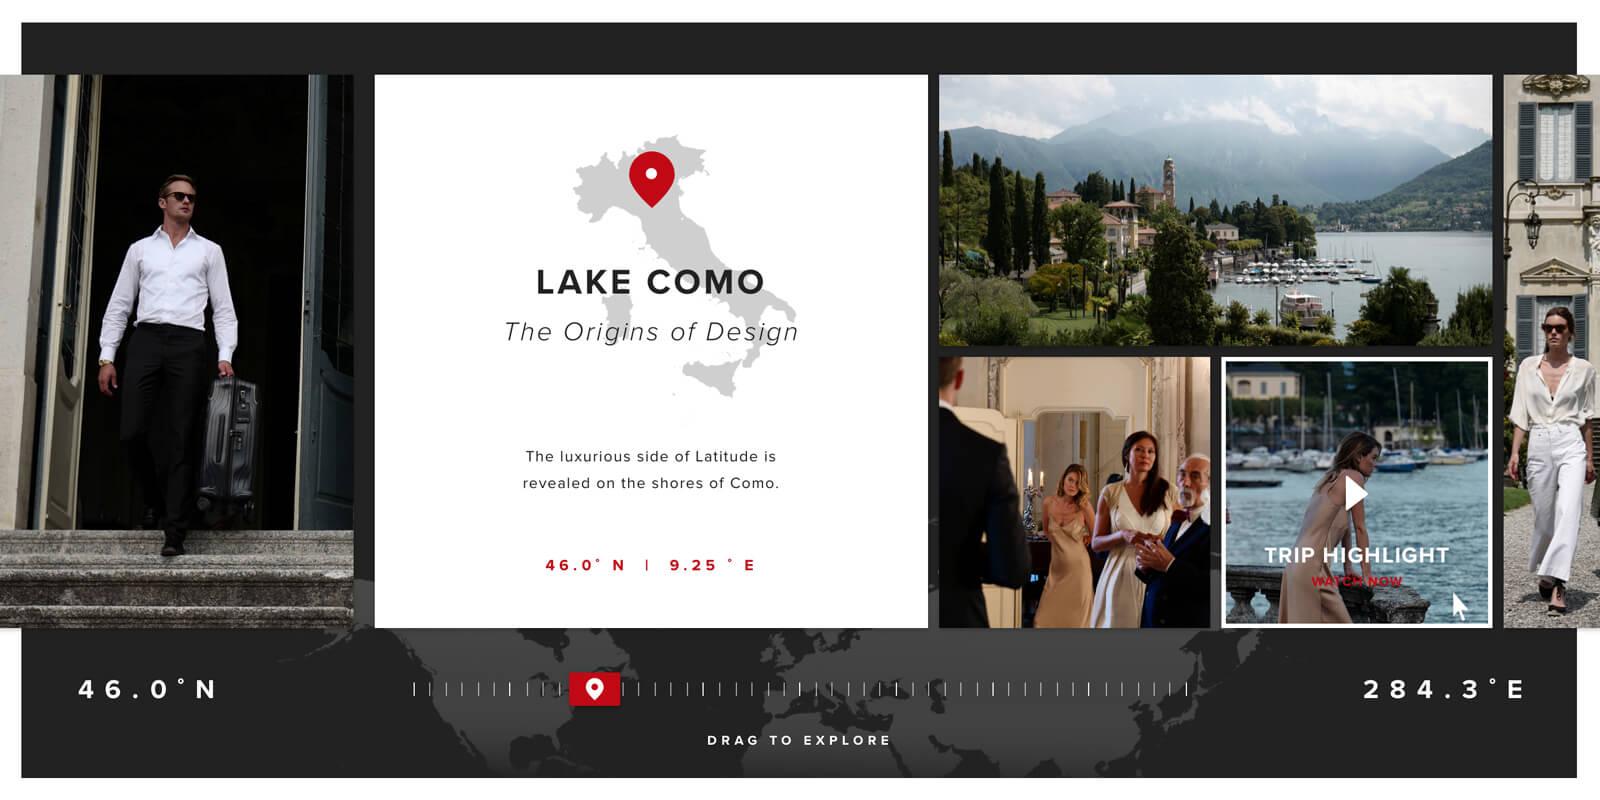 The interactive journey hub designed for the Tumi Latitude campaign